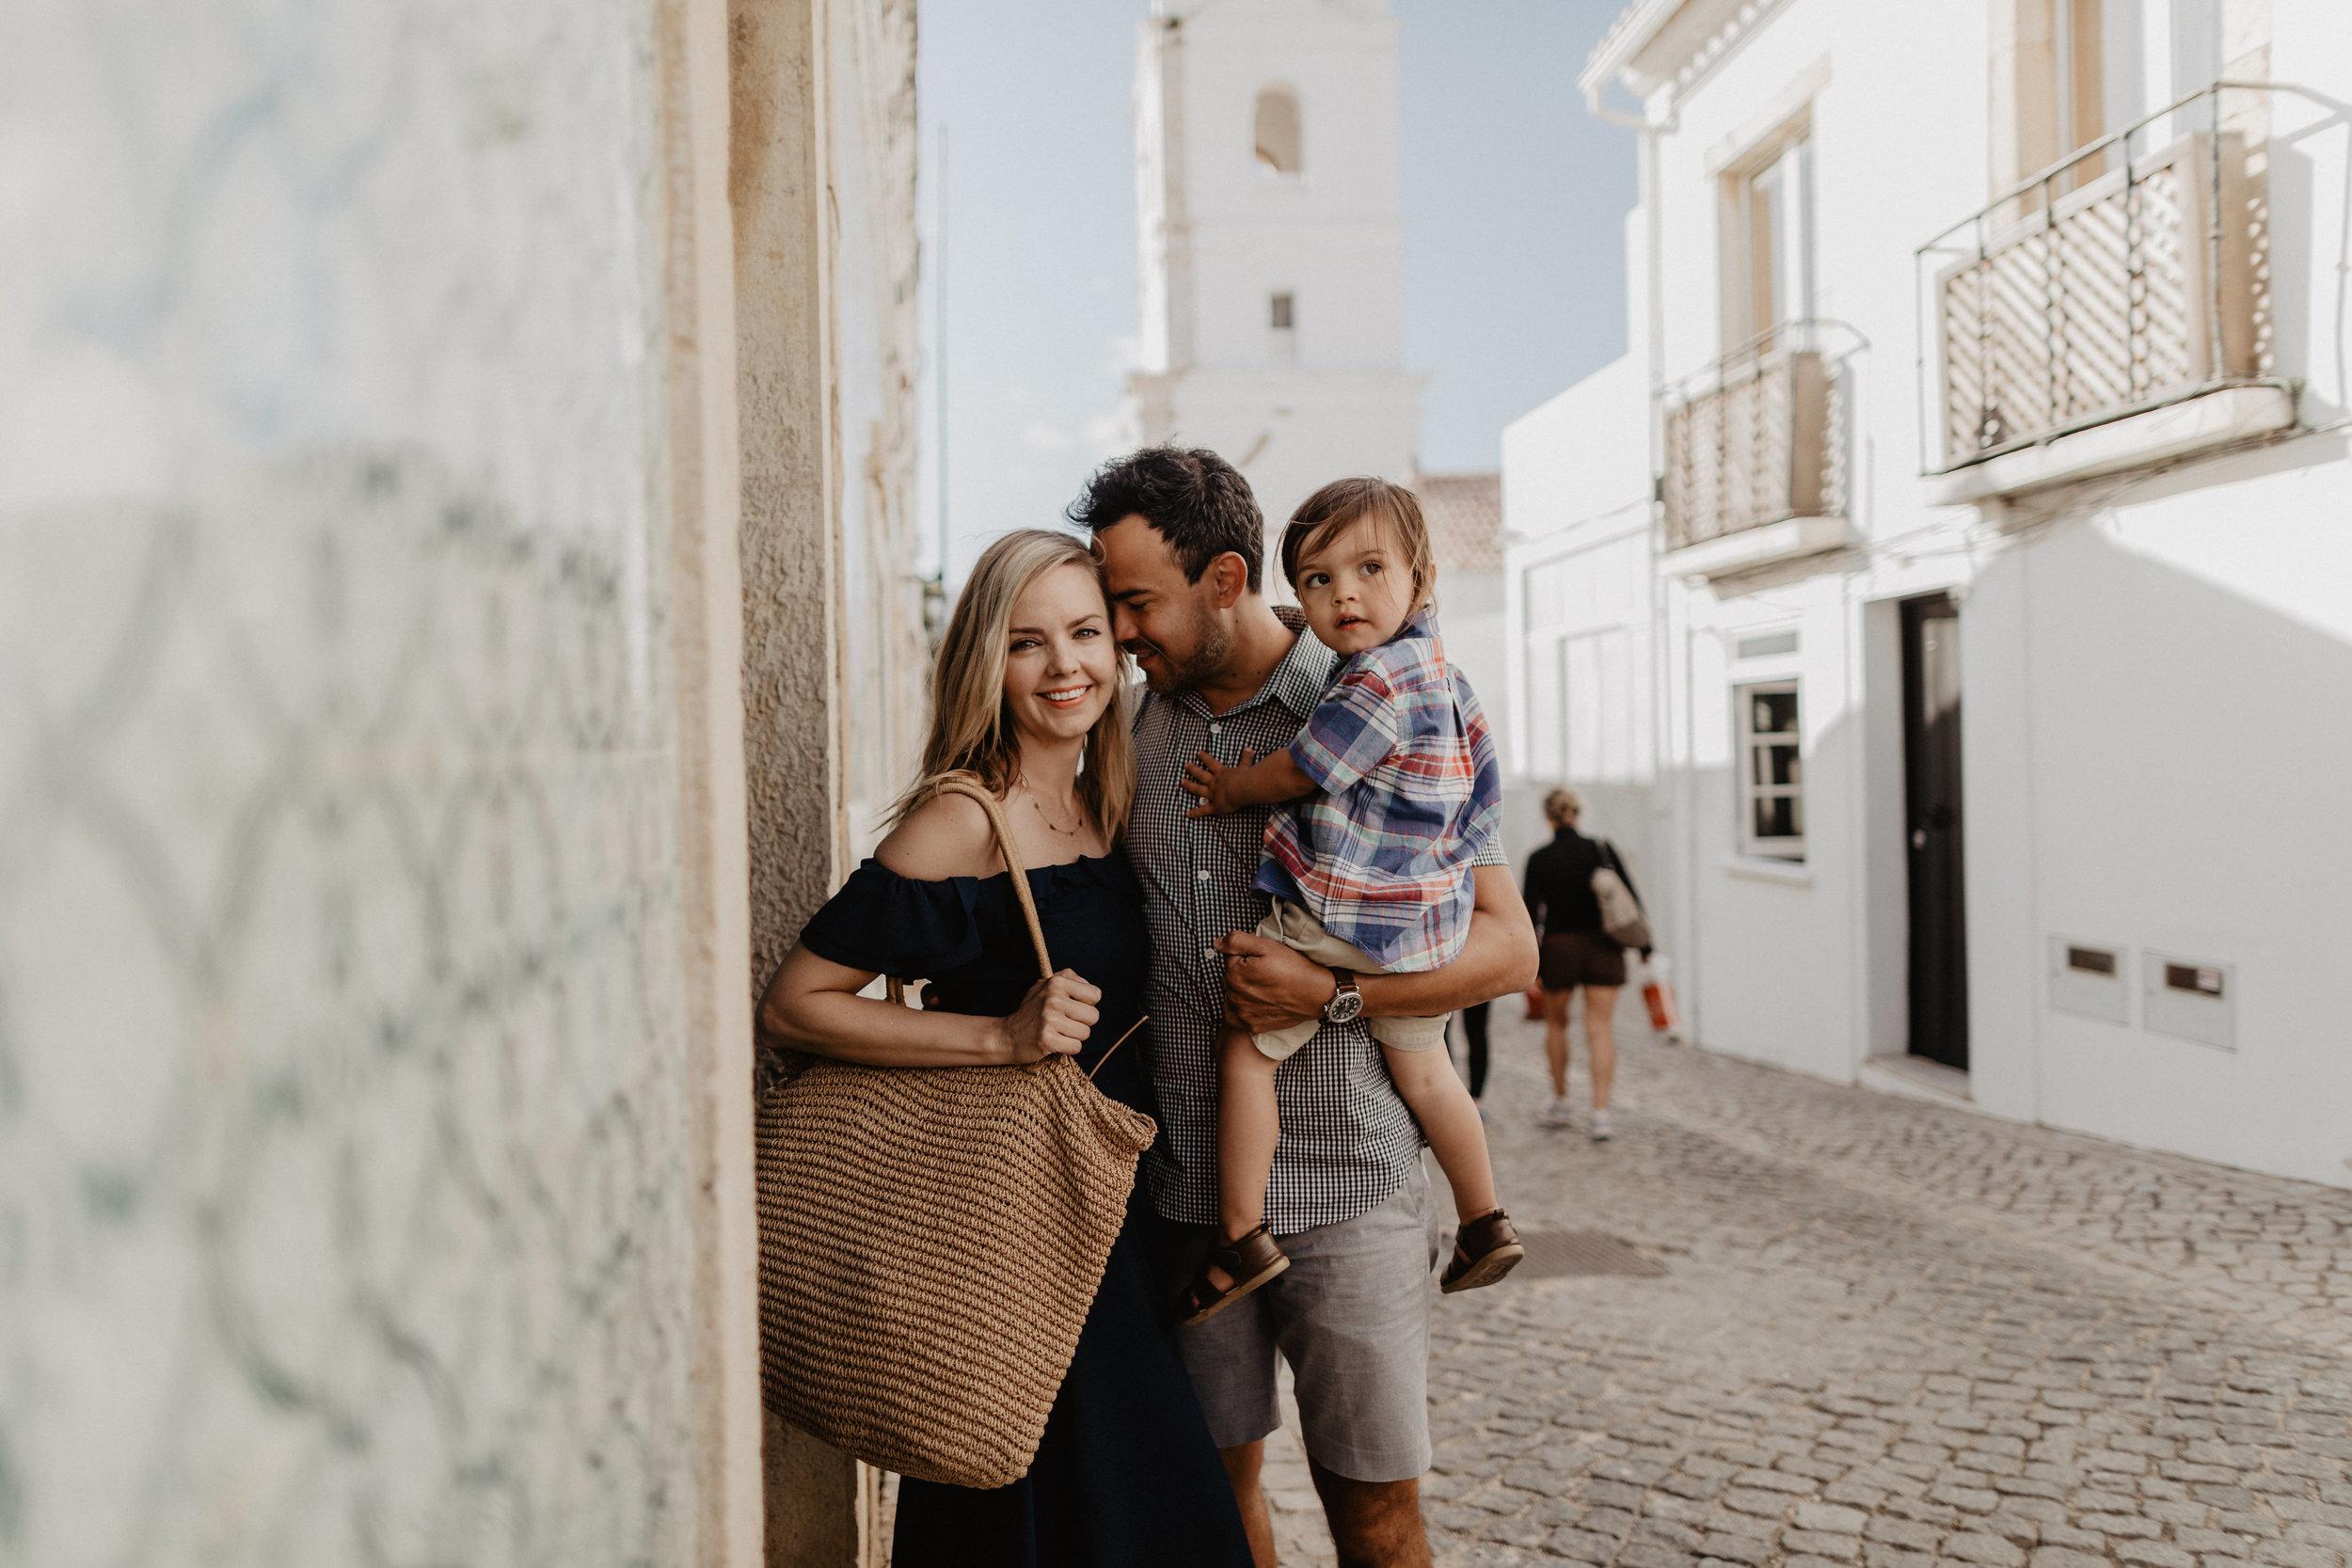 Lapela-Family-photography-Lagos-Algarve5.jpg